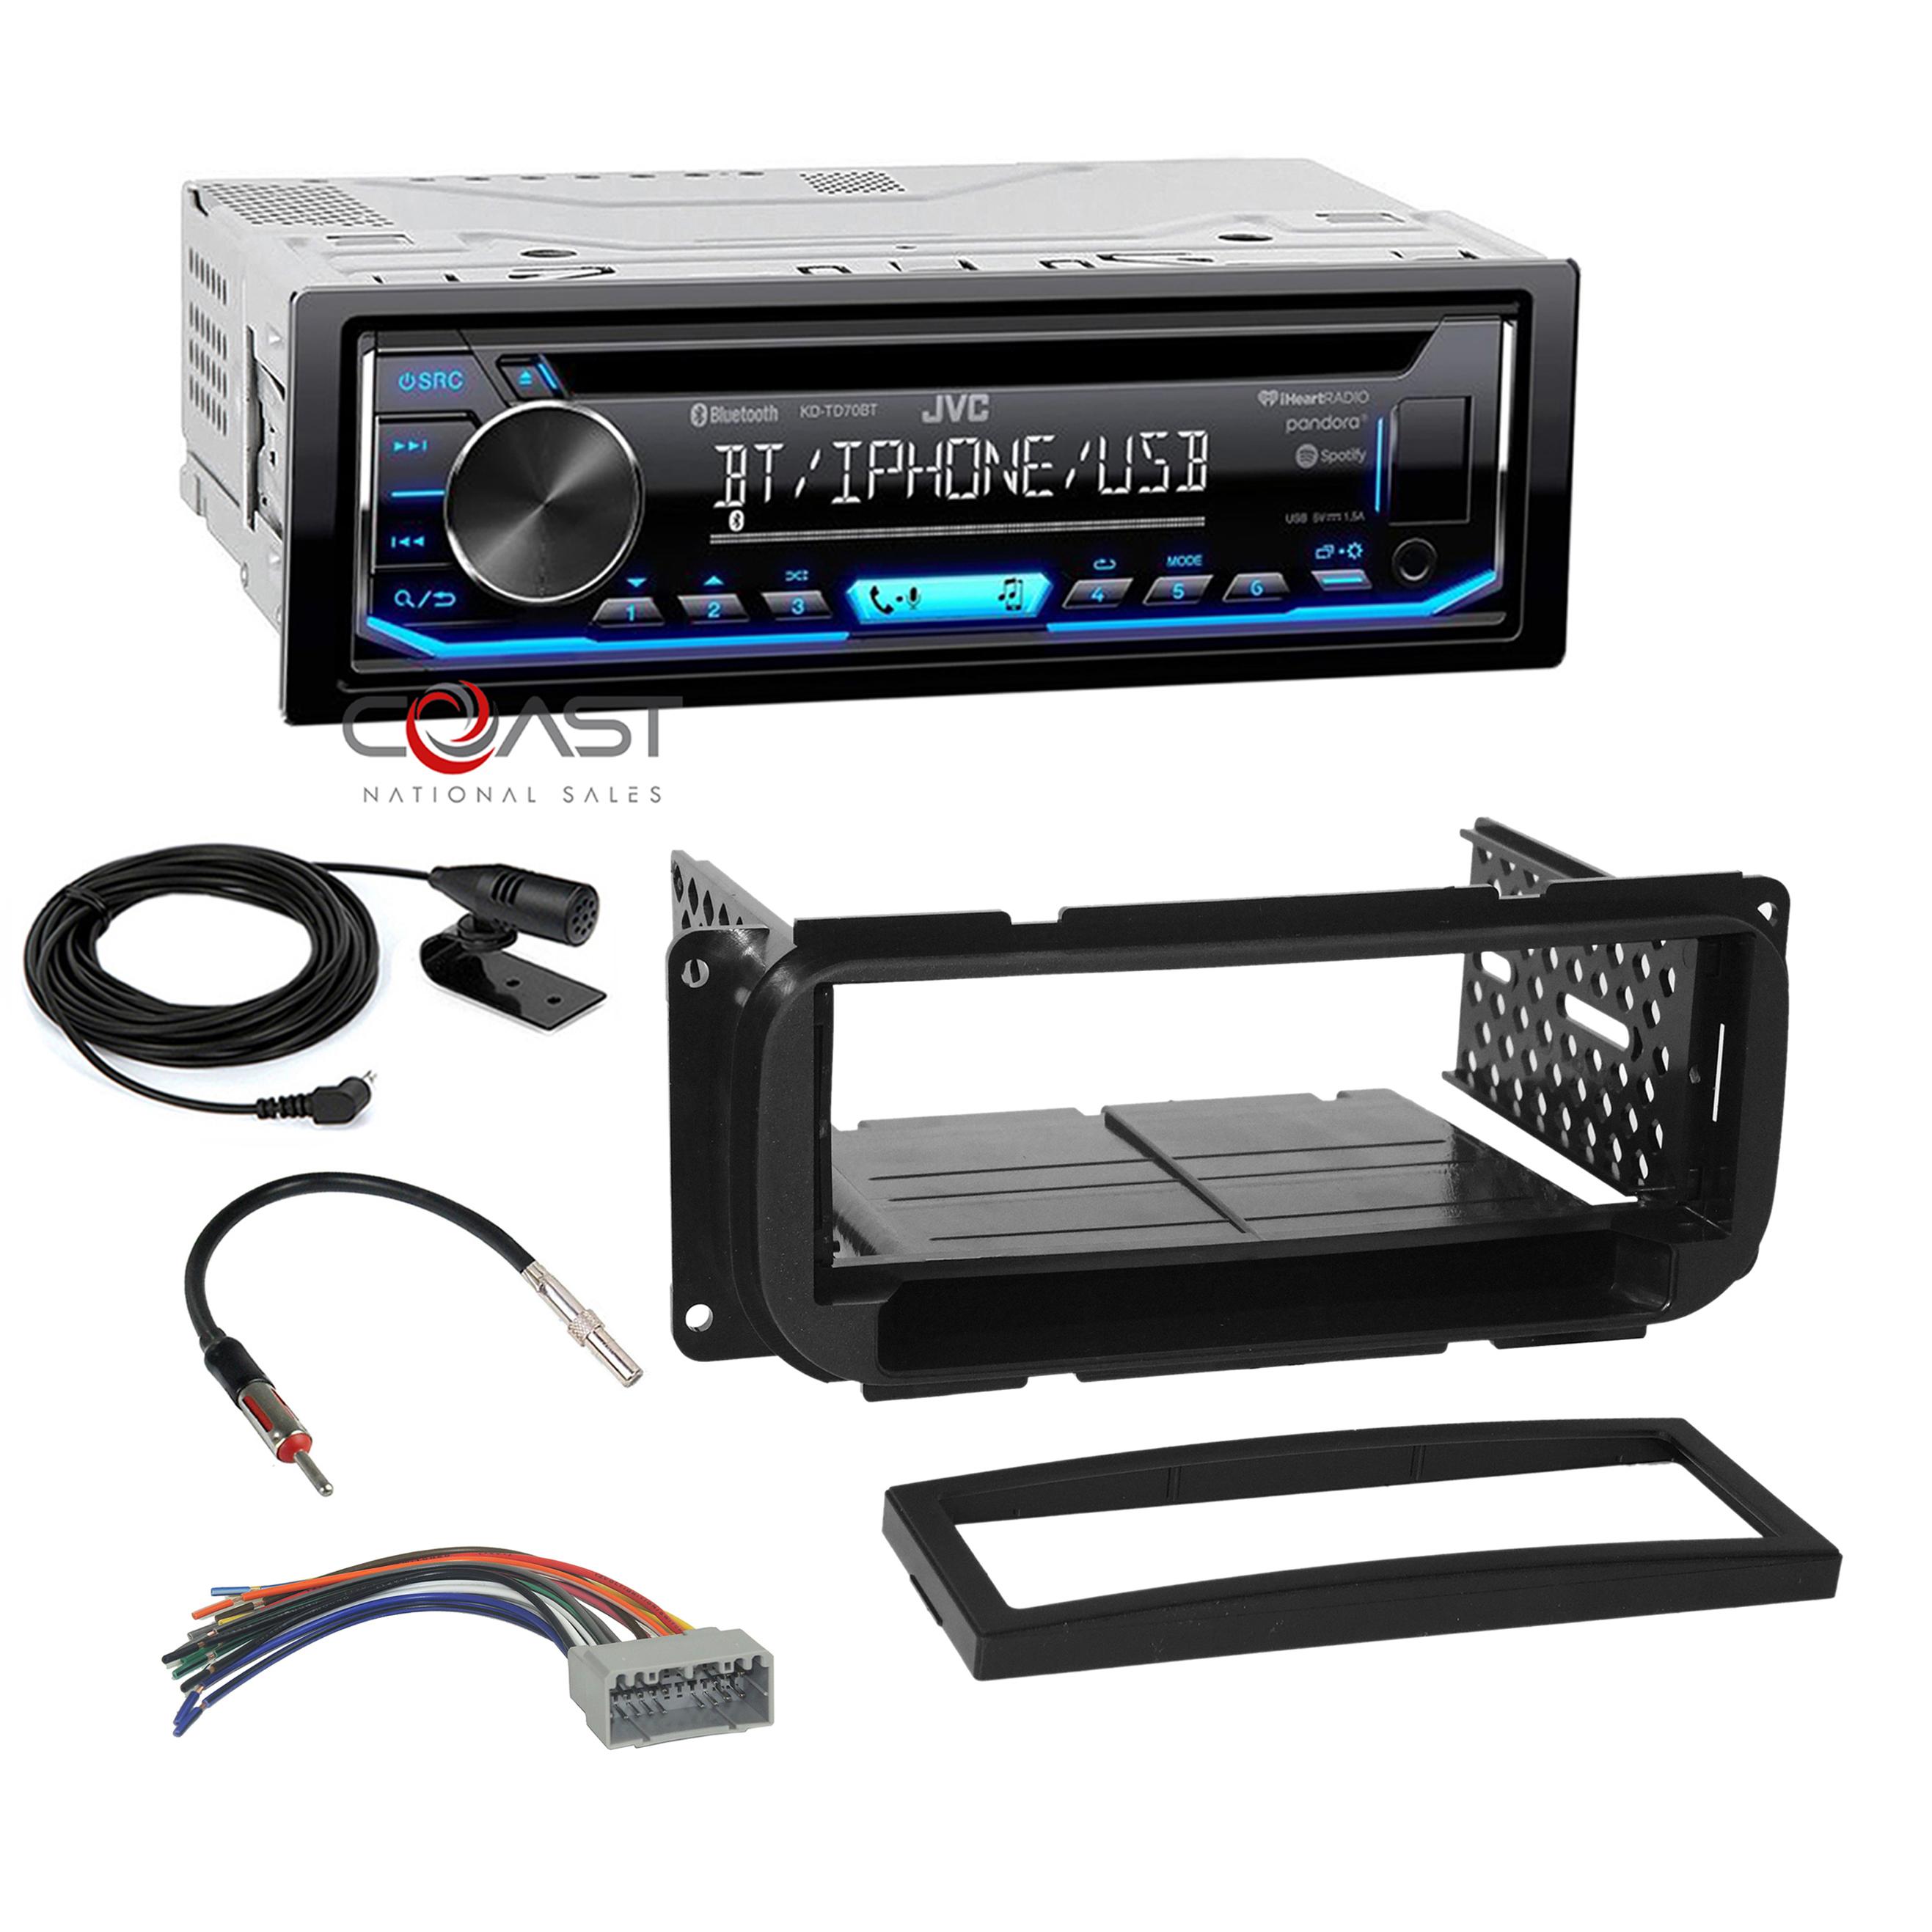 JVC Car Stereo Radio Single Din Dash Kit Harness For 02-up Chrysler Dodge Jeep